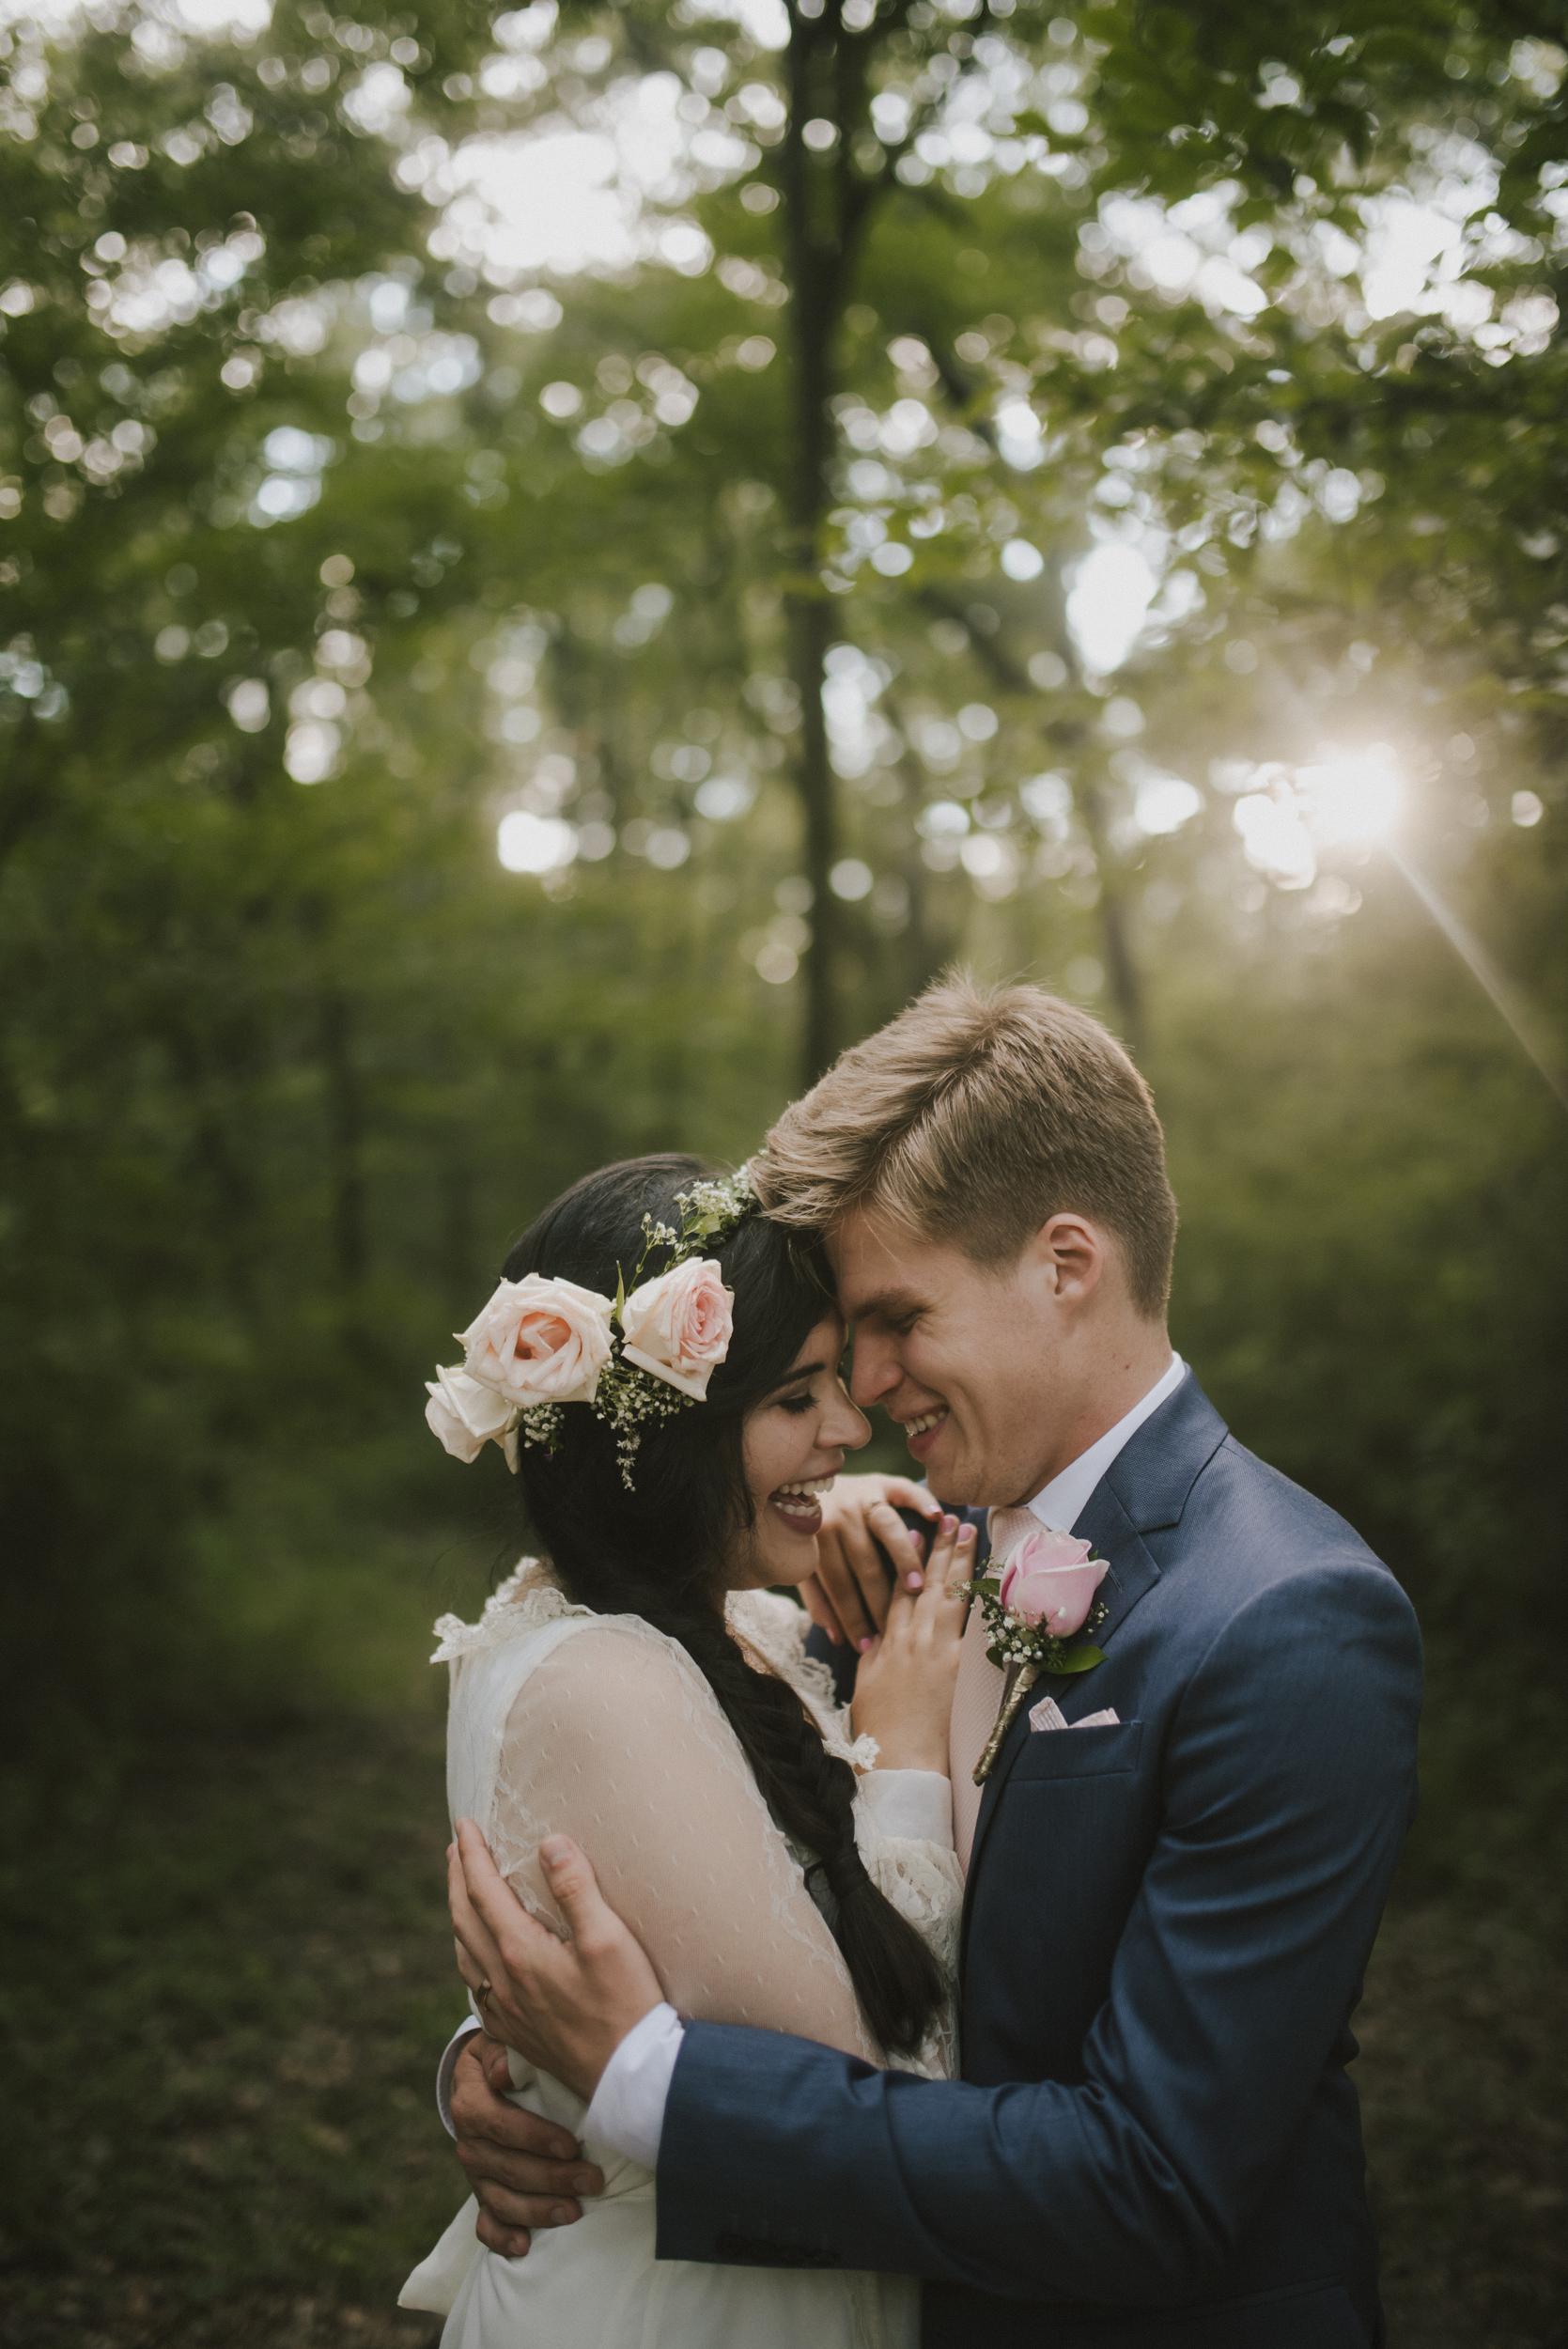 ofRen_weddingphotographer-149.jpg